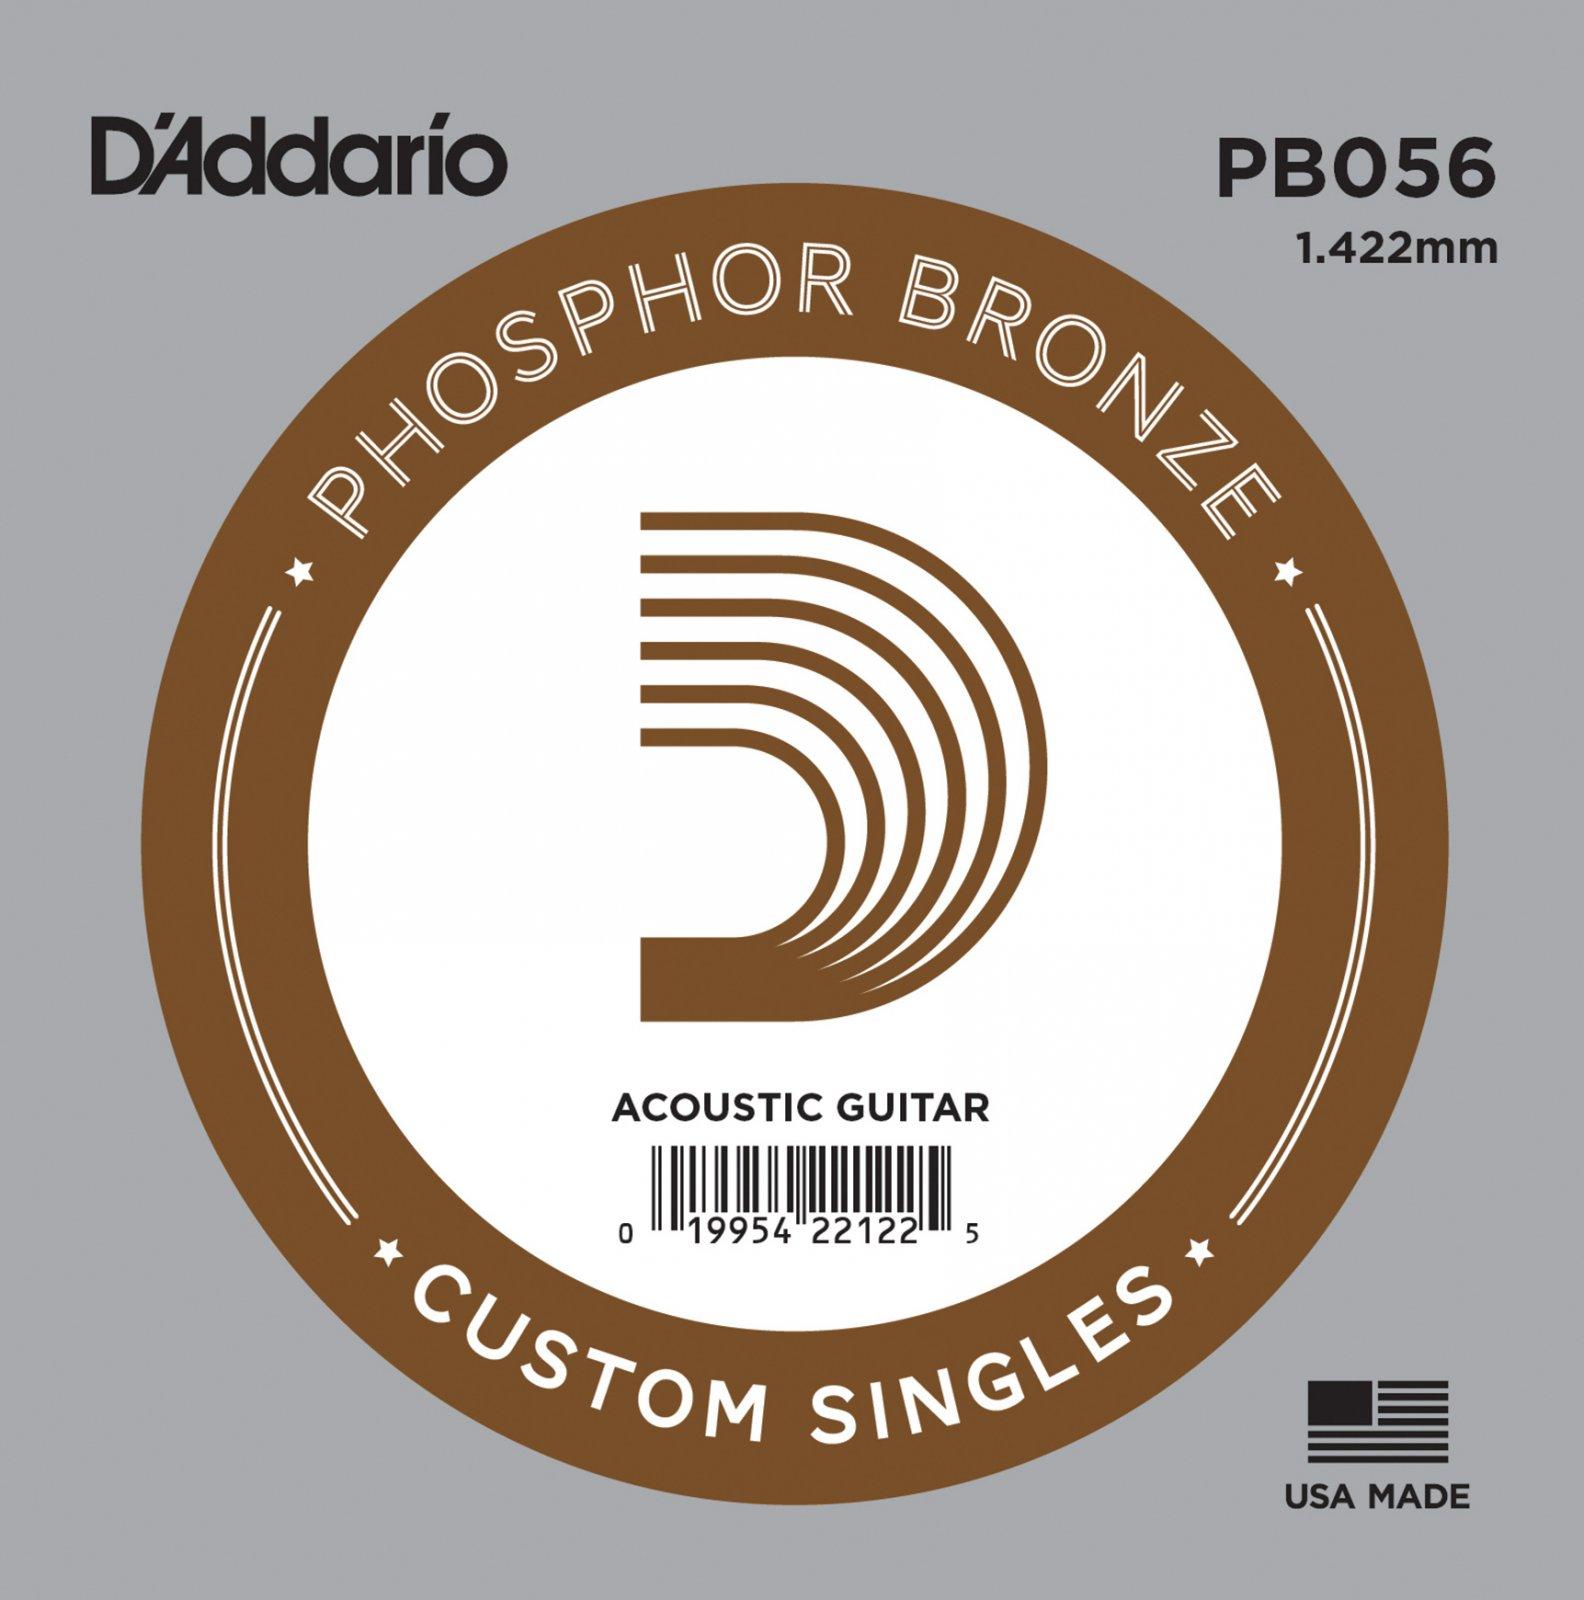 D'Addario .056 Phosphor Bronze Acoustic Guitar String